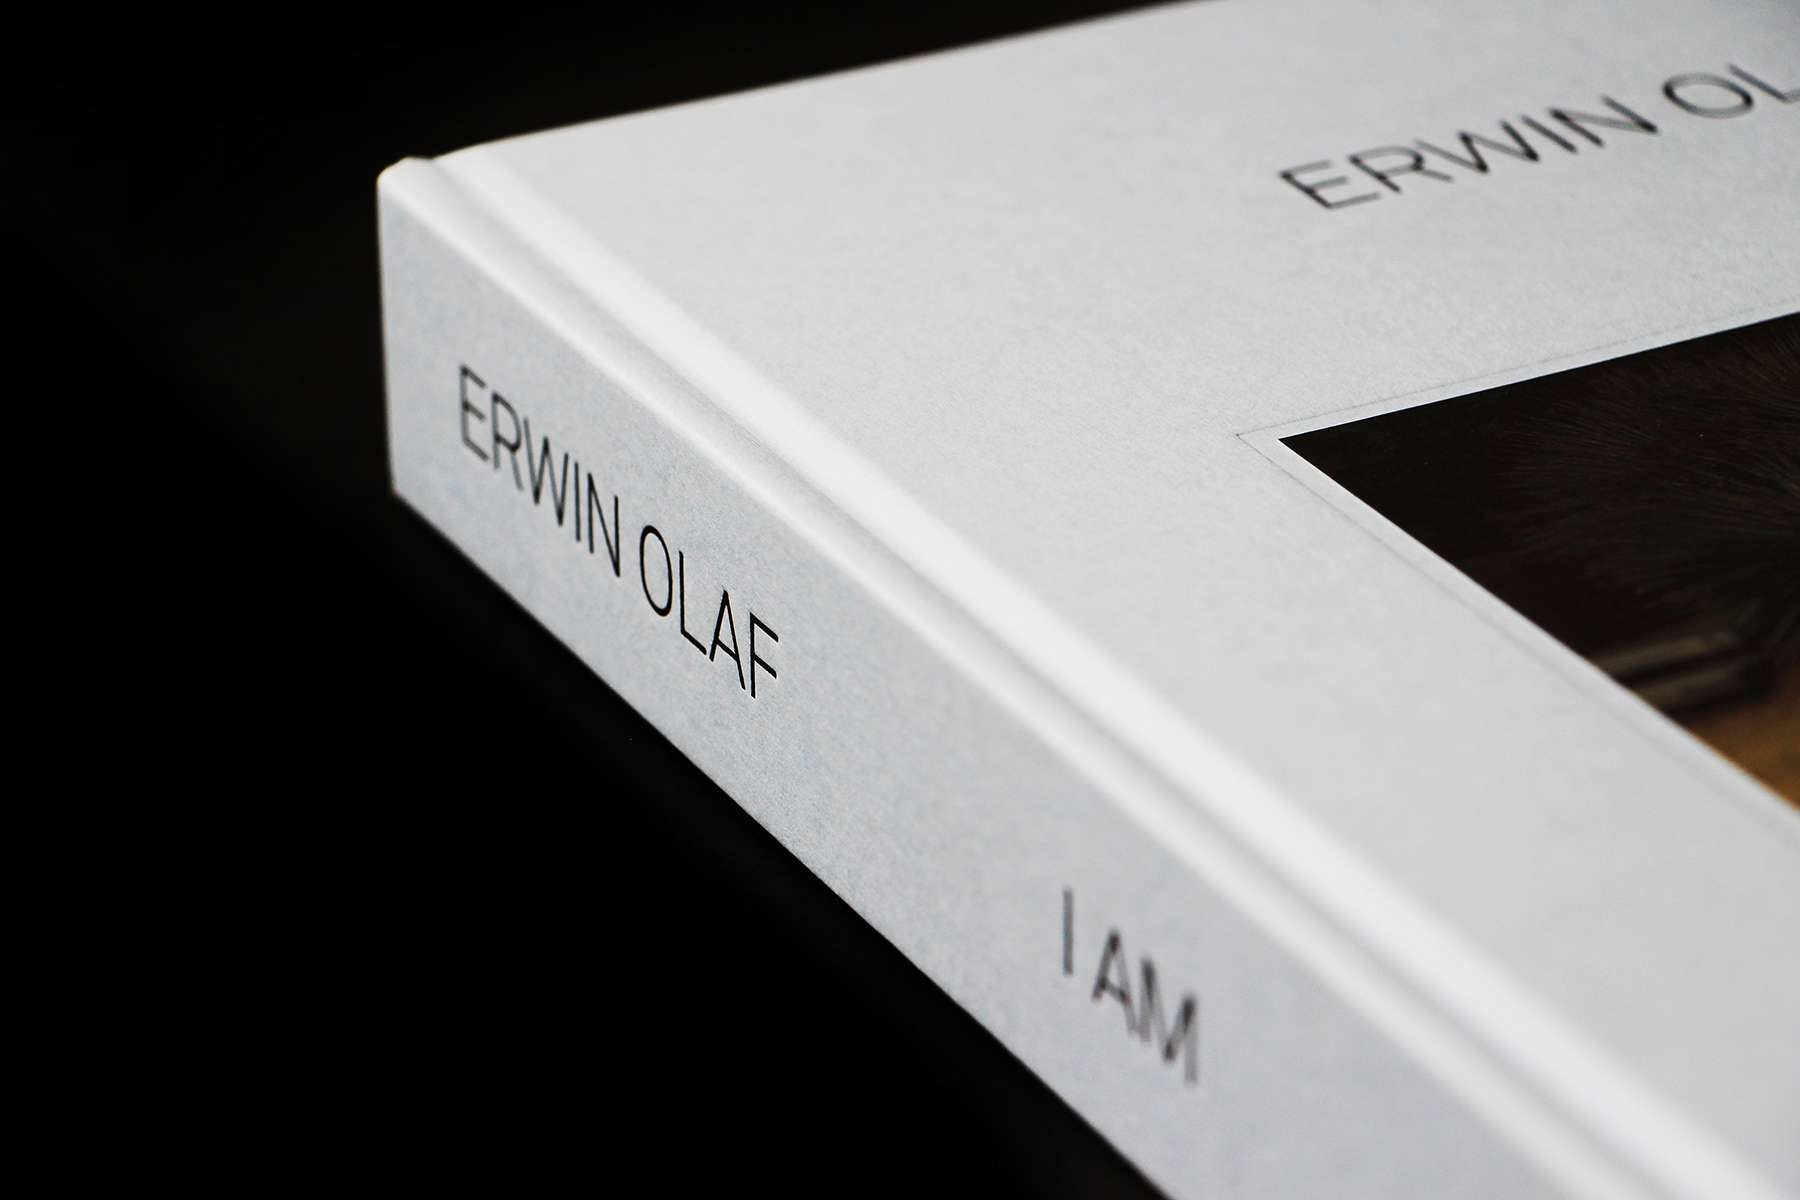 Erwin Olaf : I am 5 (4)